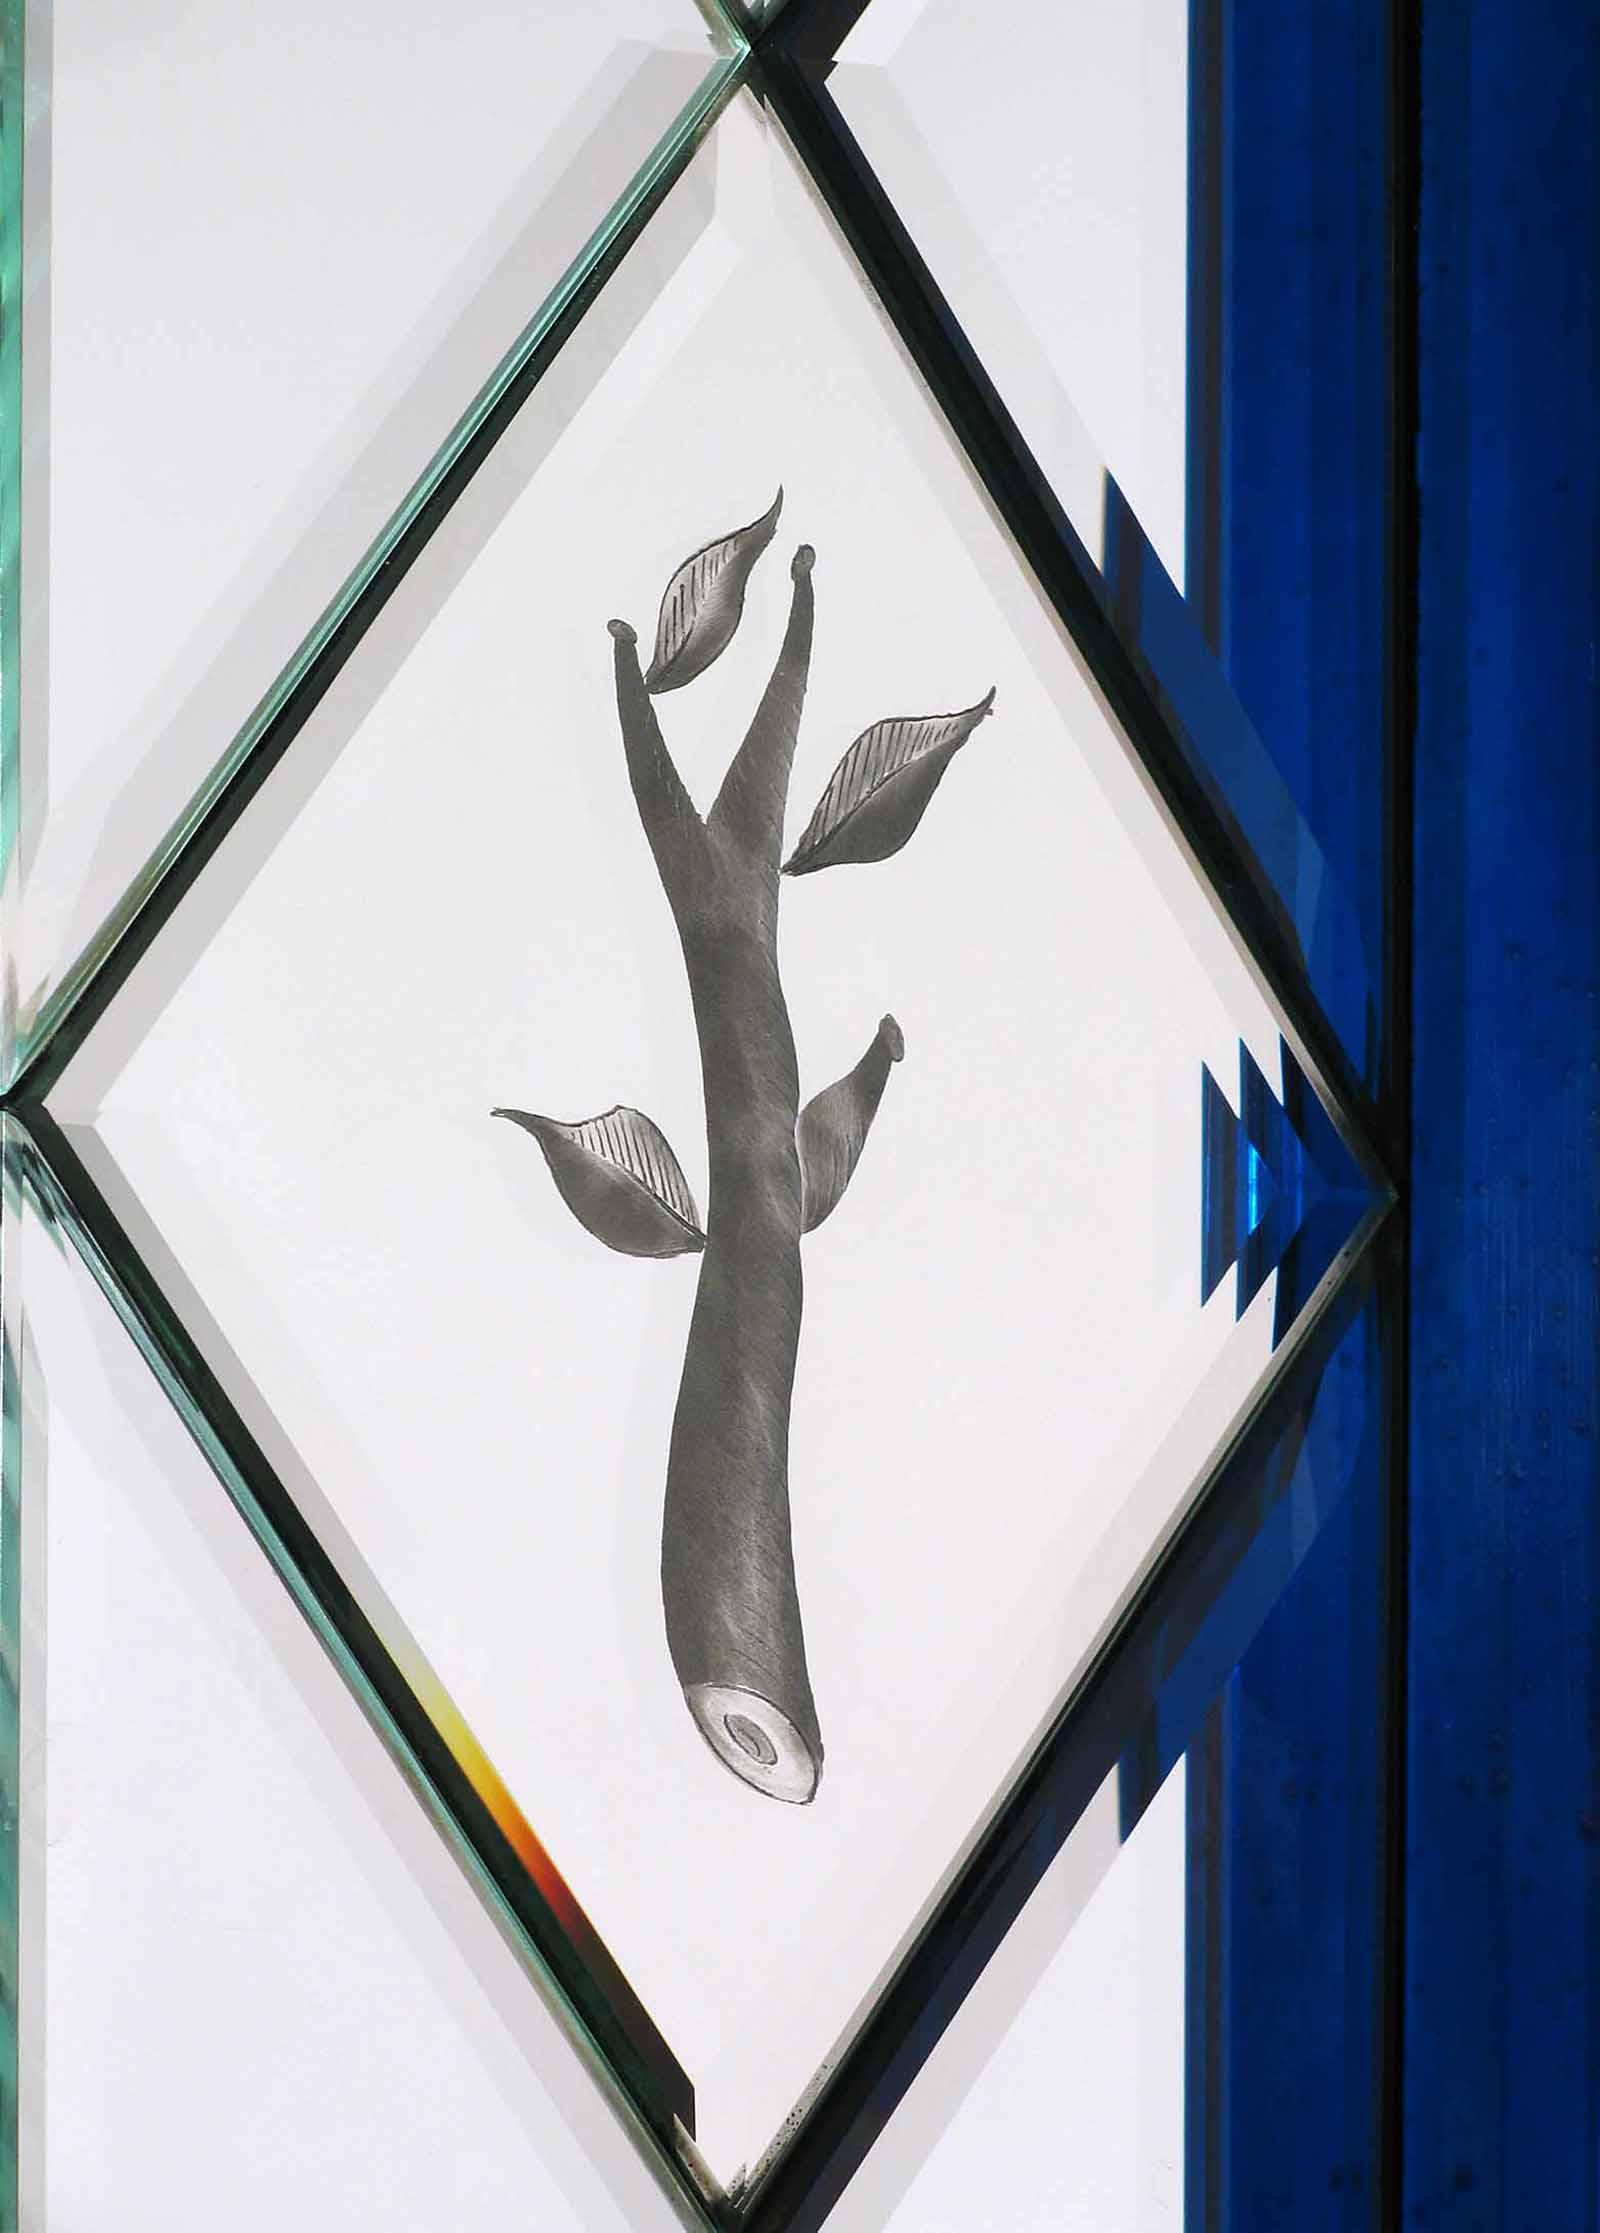 caigo-mirror-miroir-olivier-gagnere-veronese-2.jpg